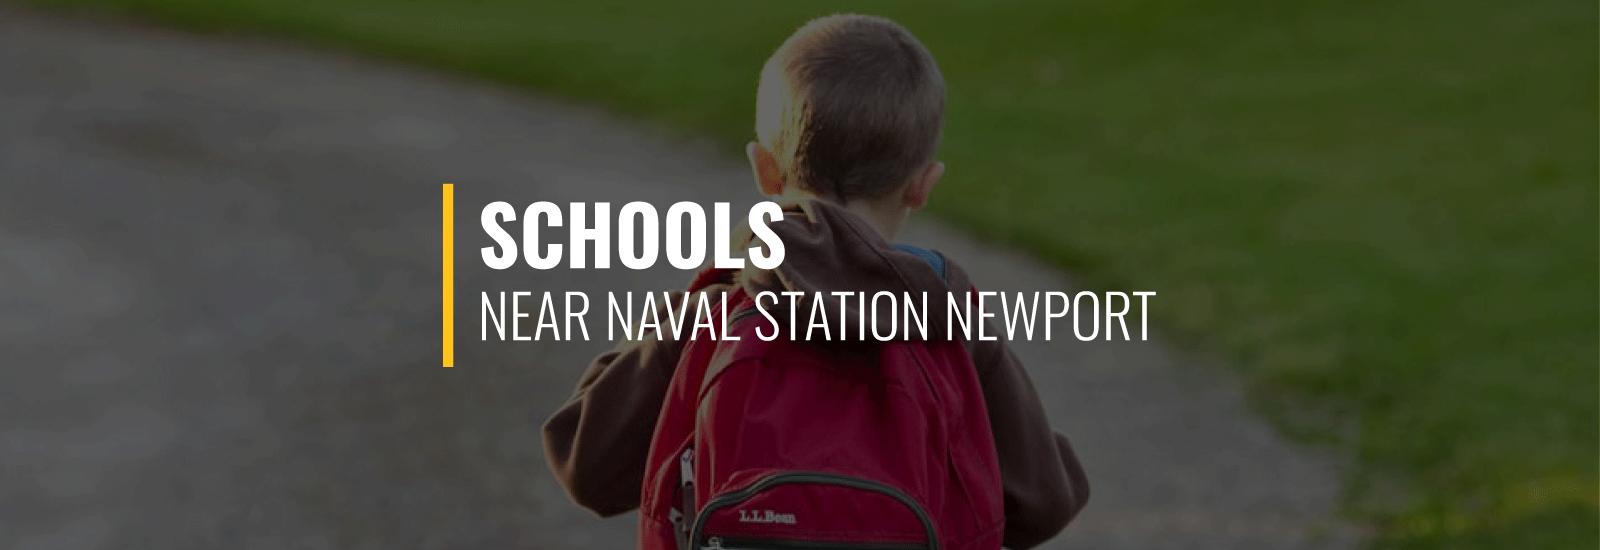 Naval Station Newport Schools